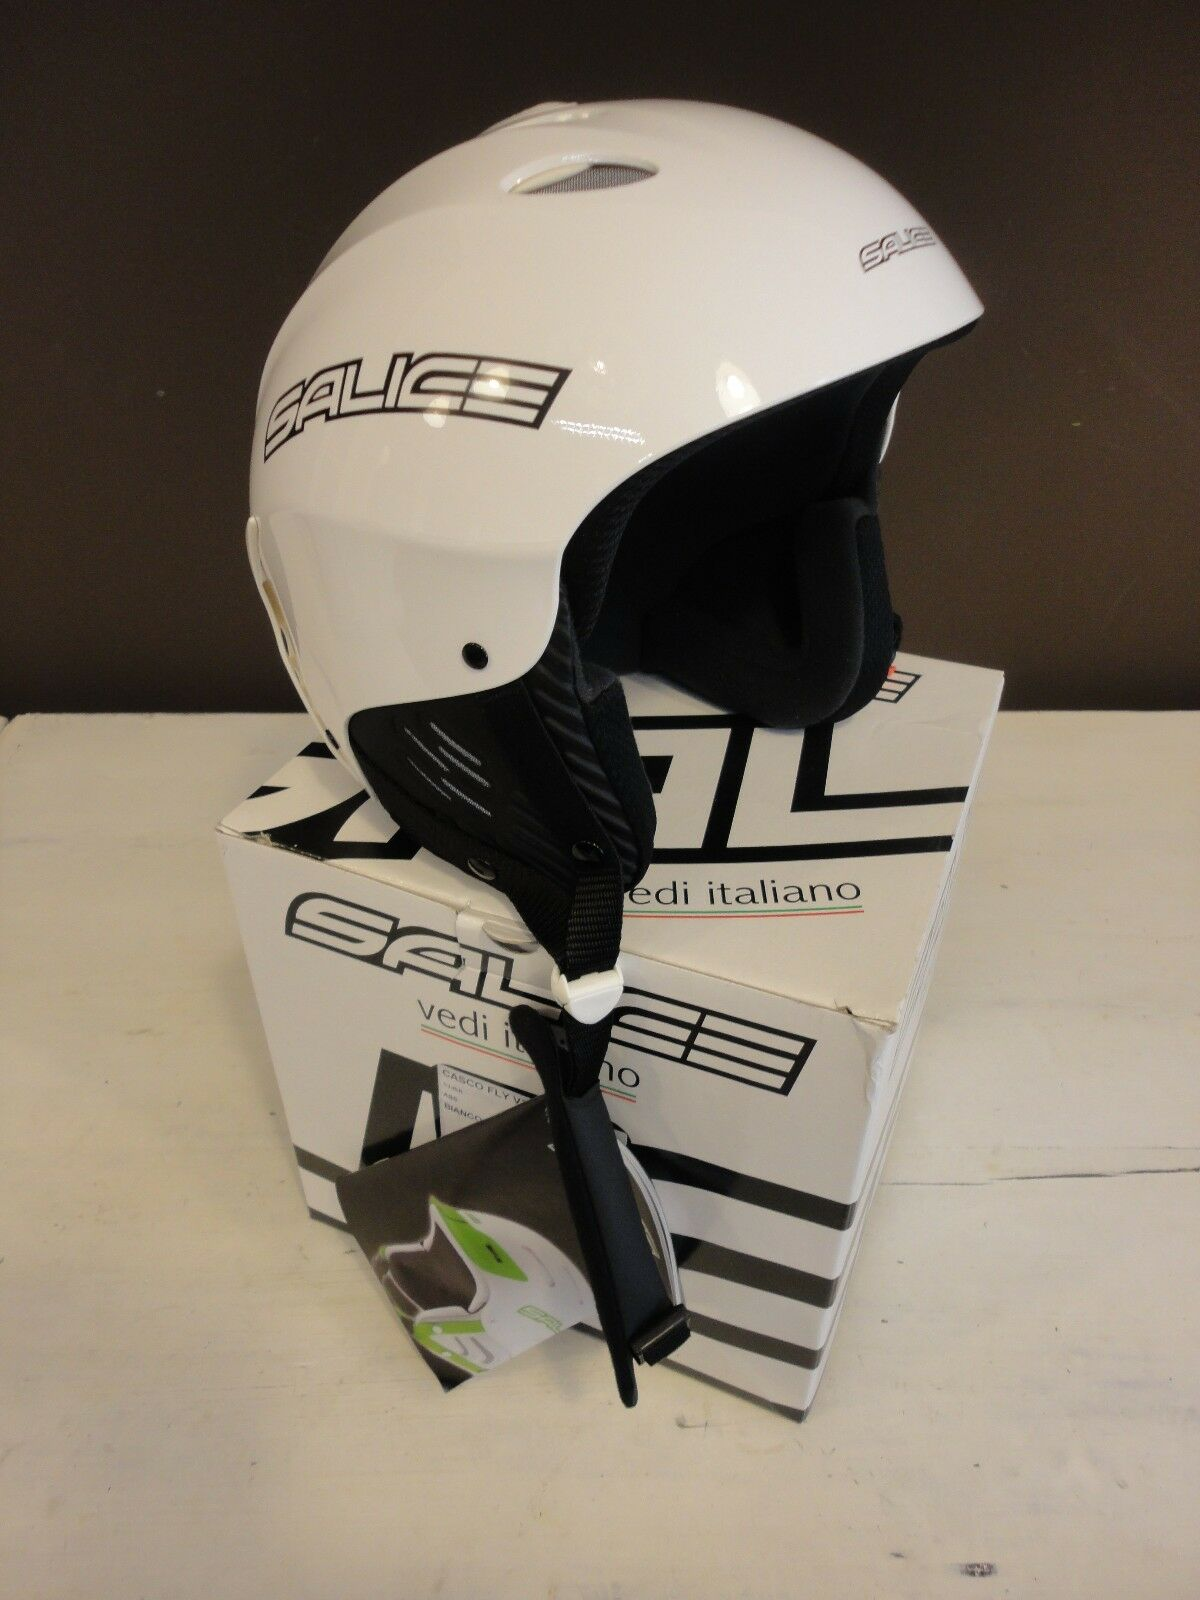 Salice Casco Fly candy white shiny ski snowboard helmet L NEW